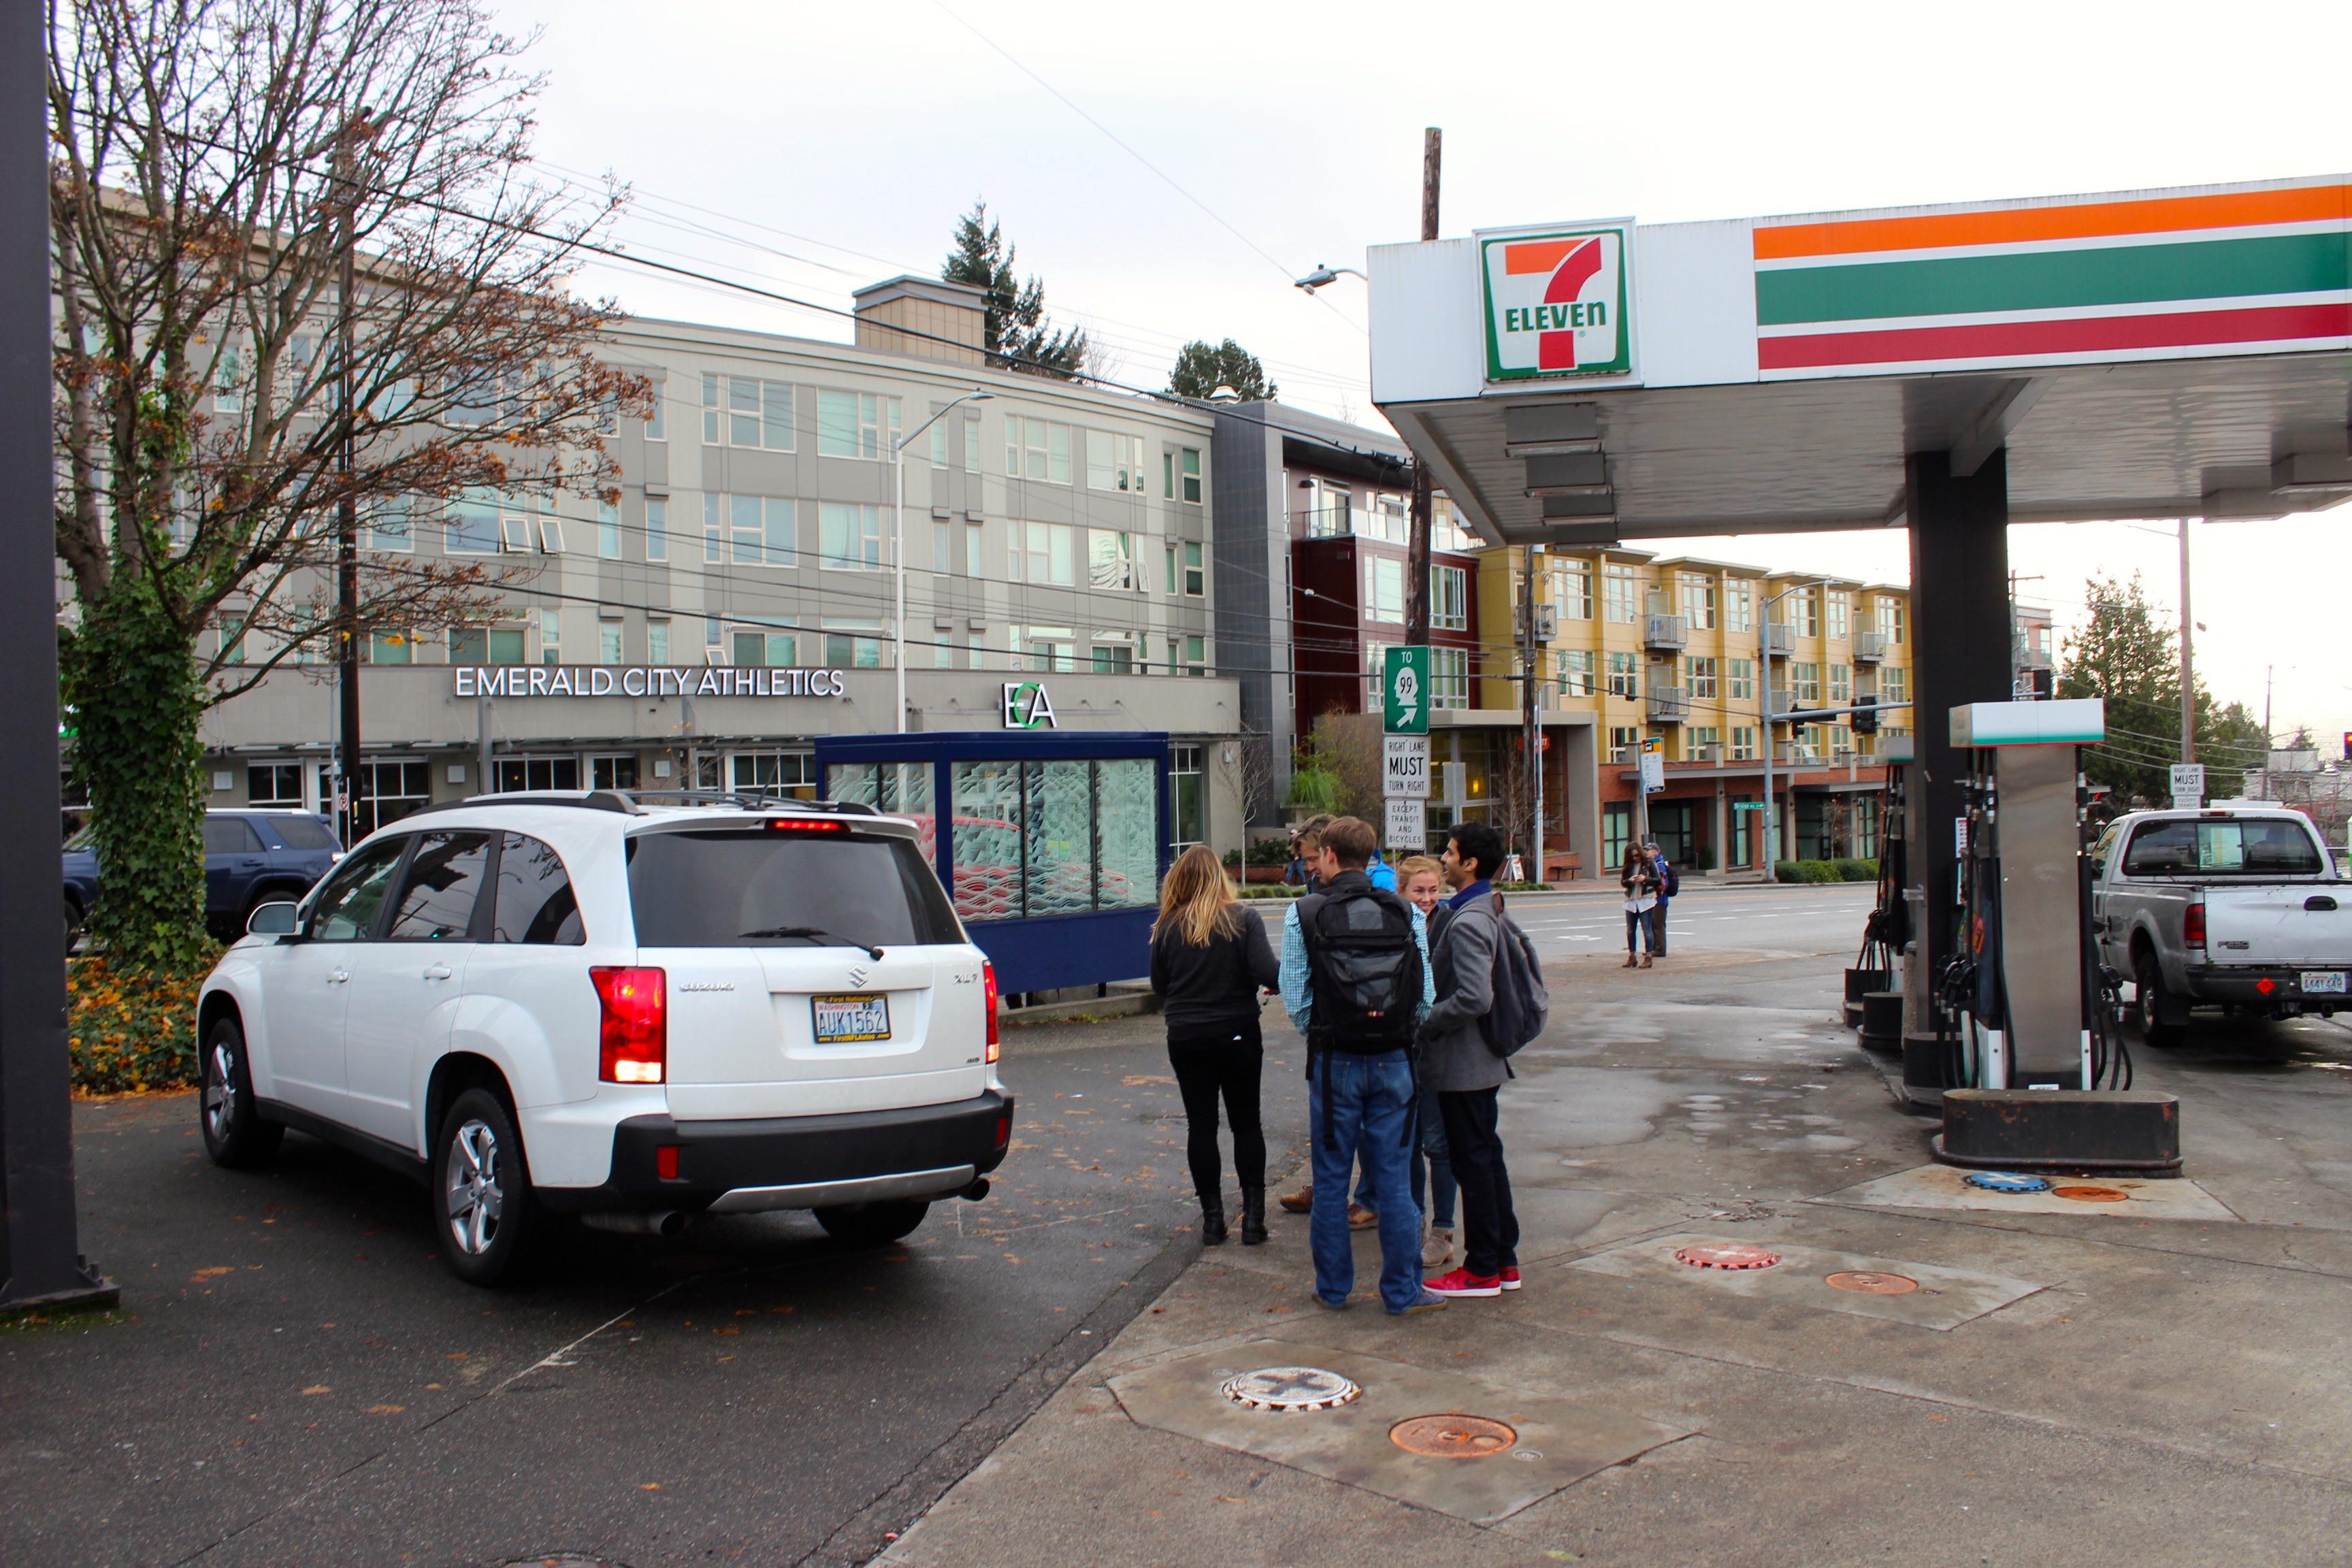 Testing uberHOP in Seattle: Uber's new $5 carpool service